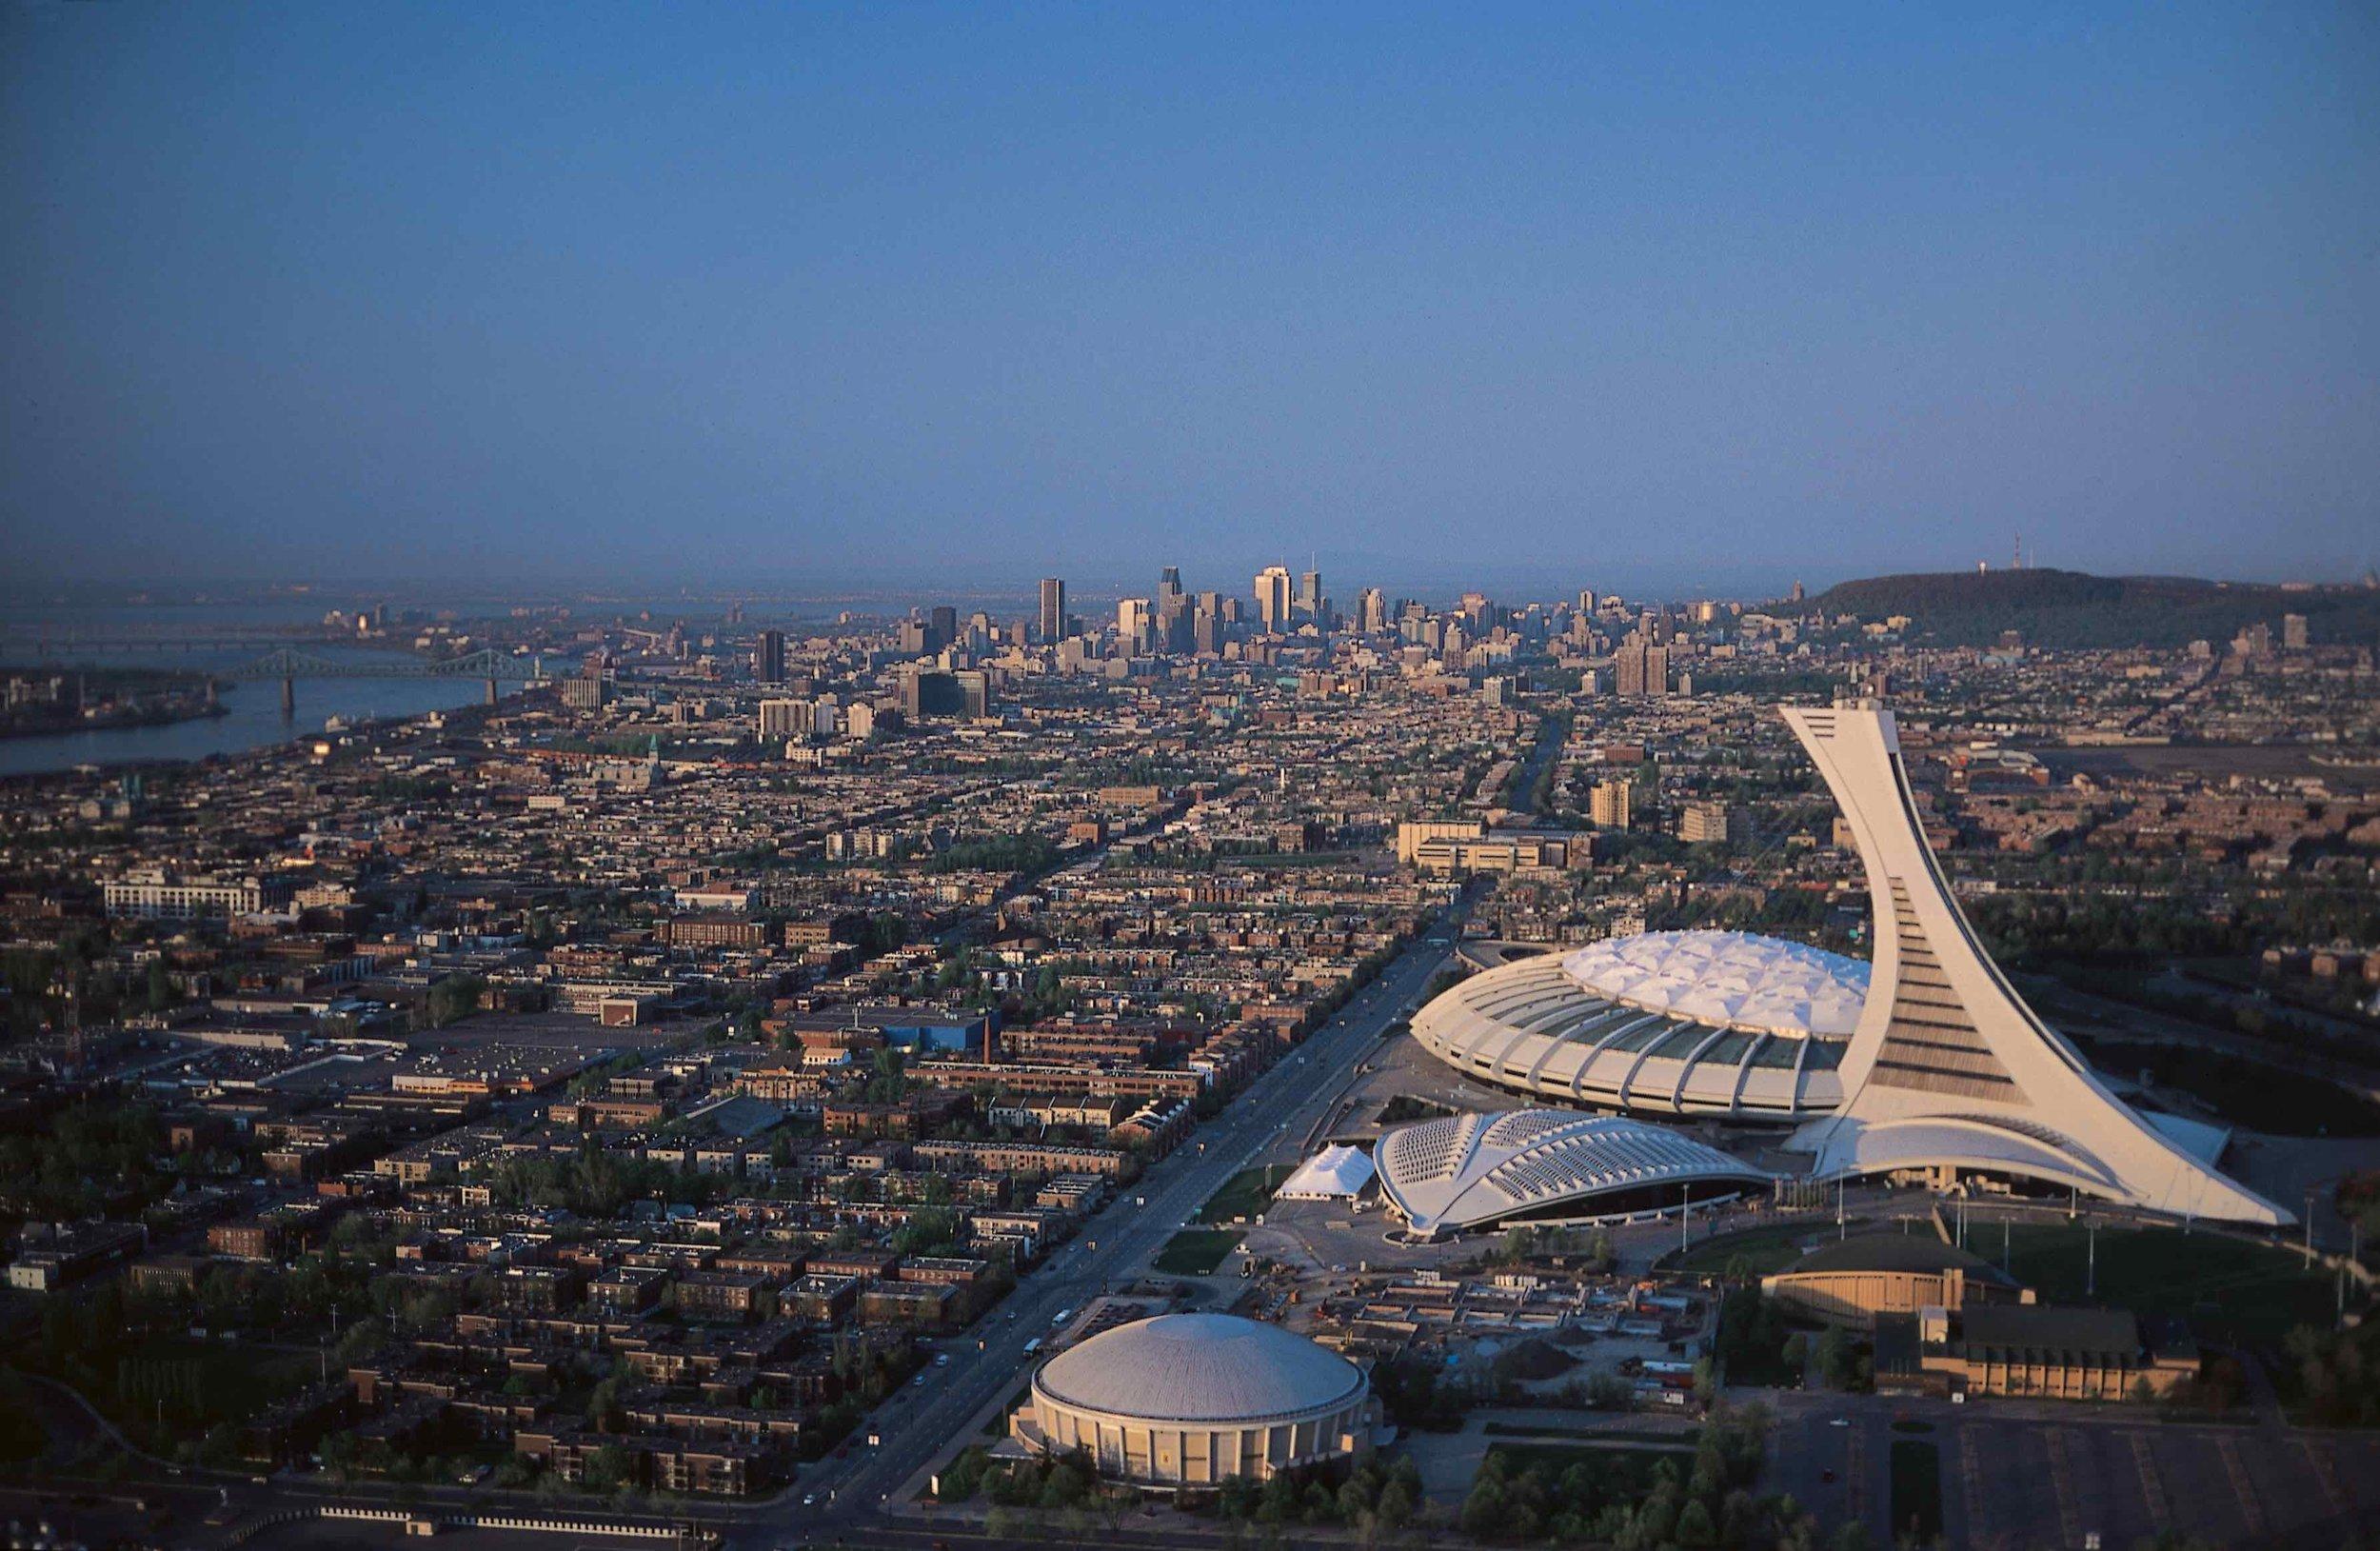 7) Olympic Stadium & Montreal Tower